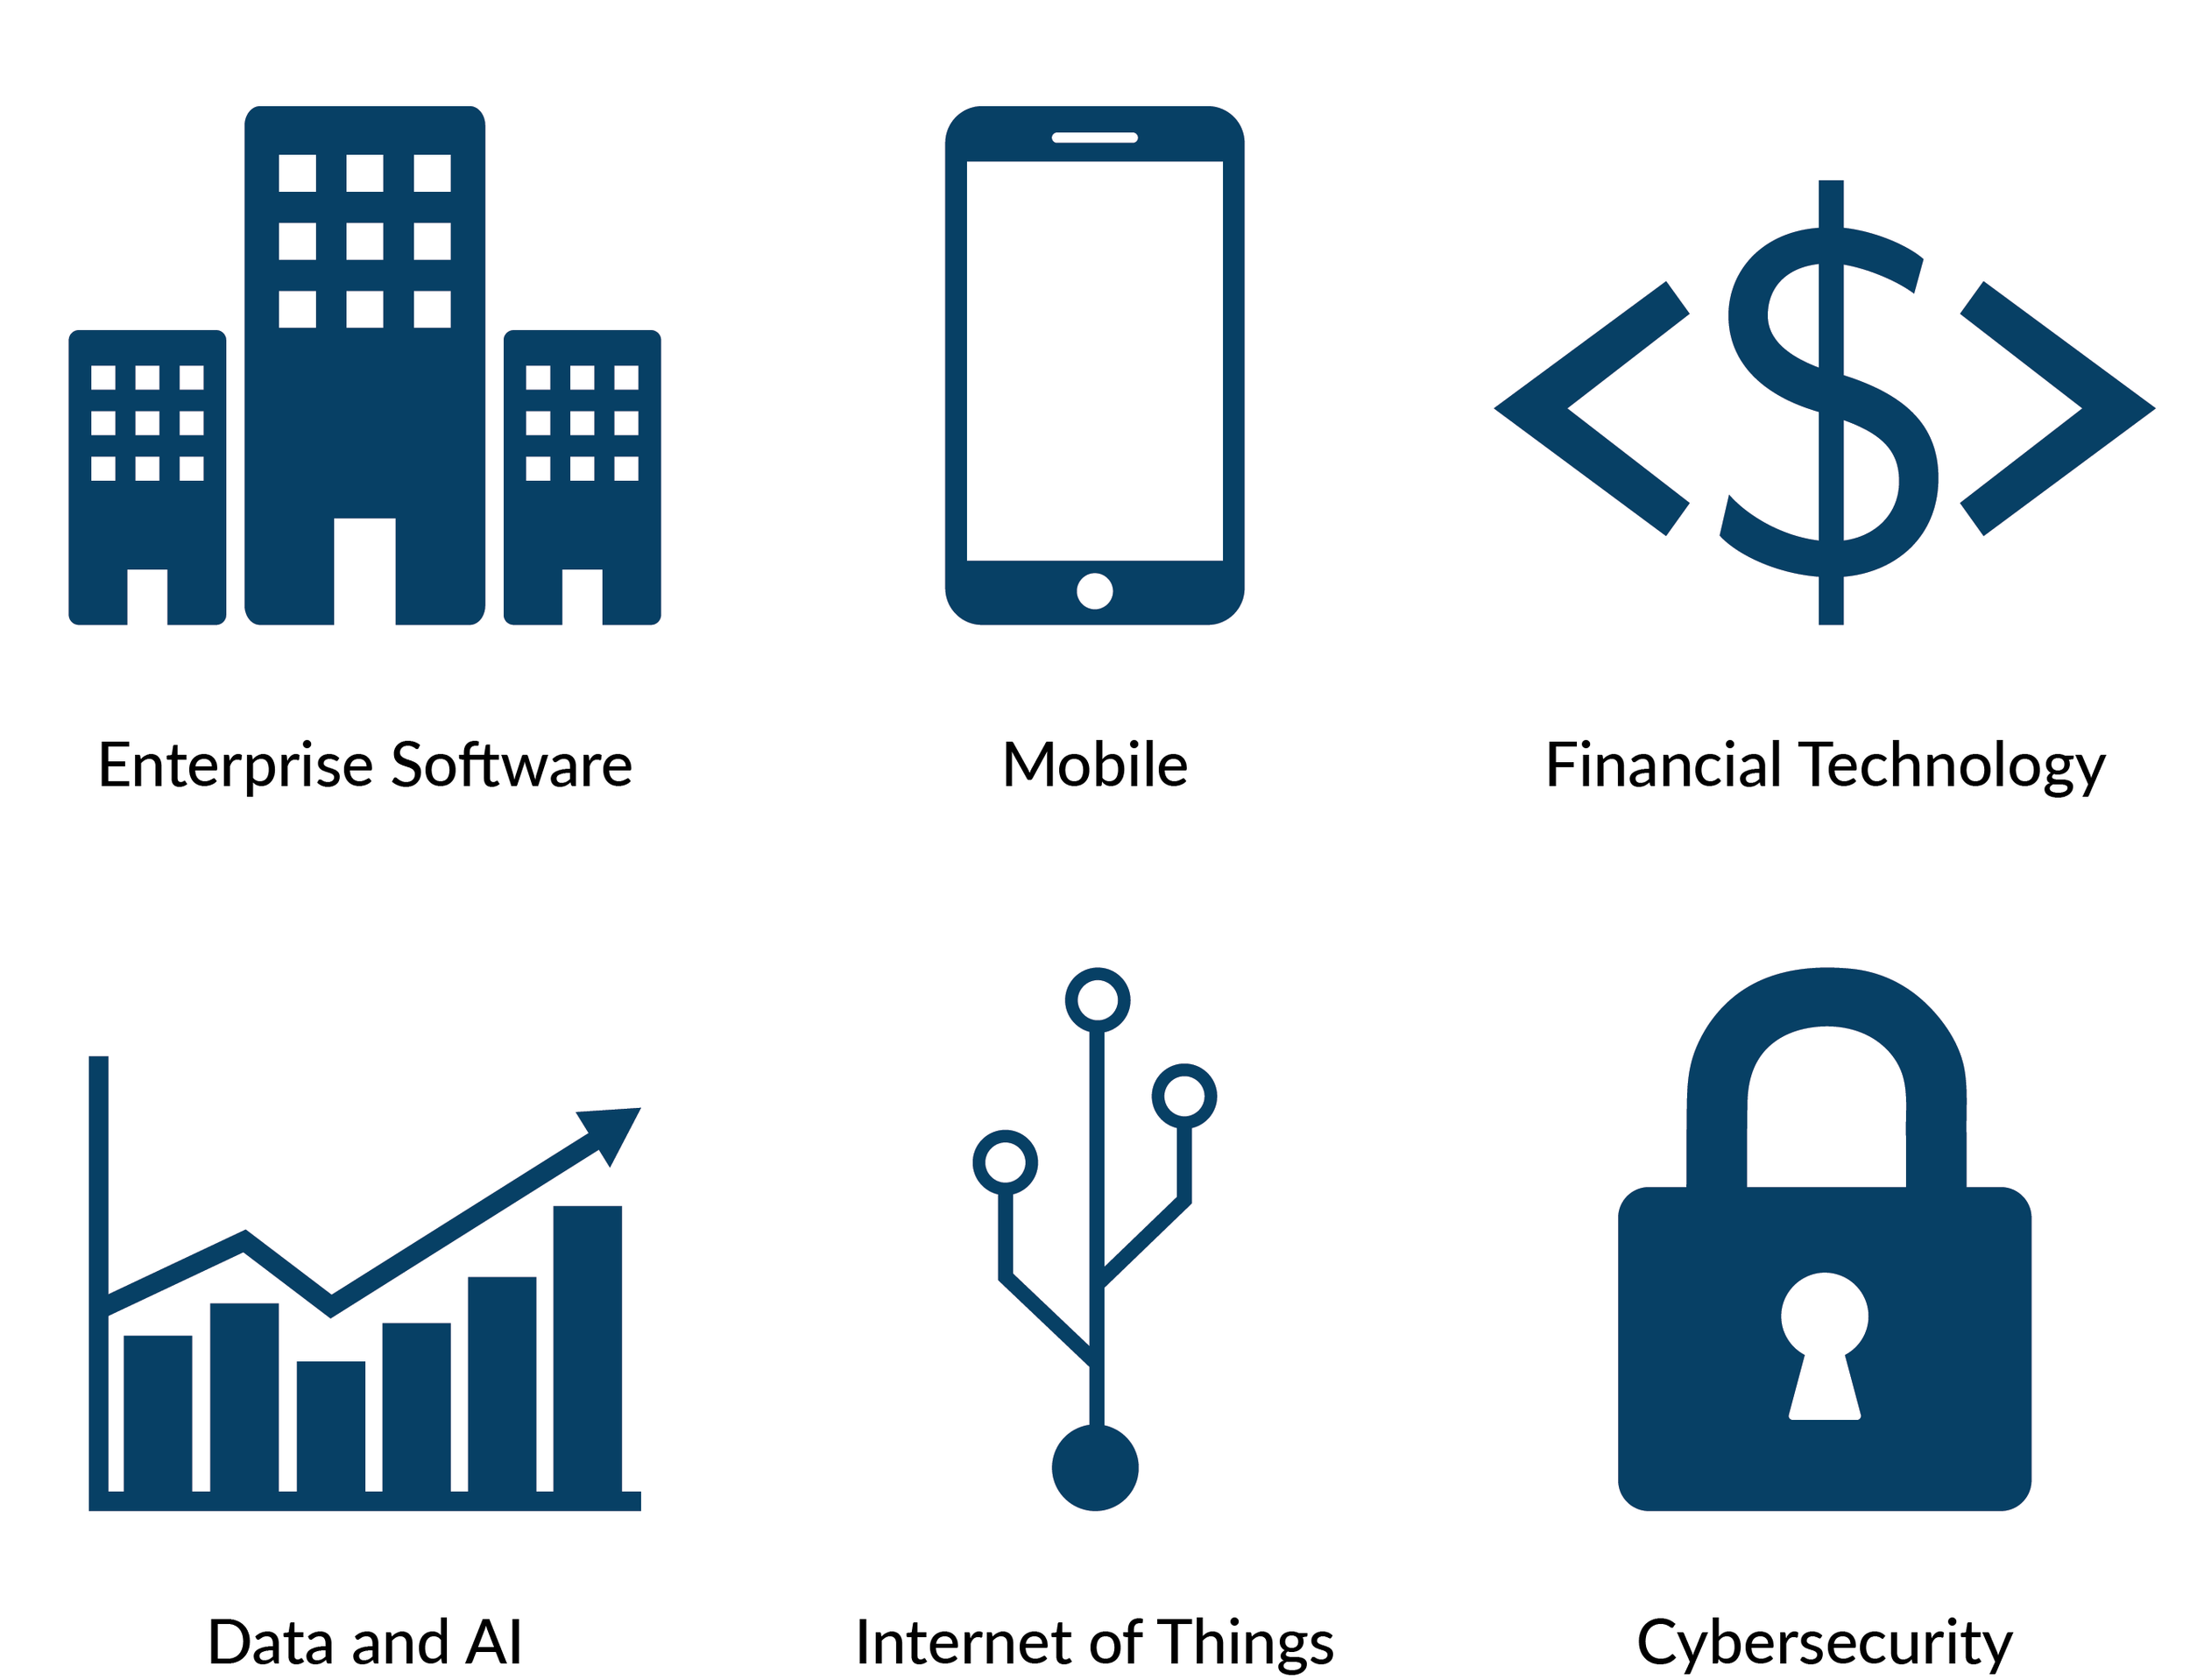 Enterprise Software                 Mobile                  Financial Technology